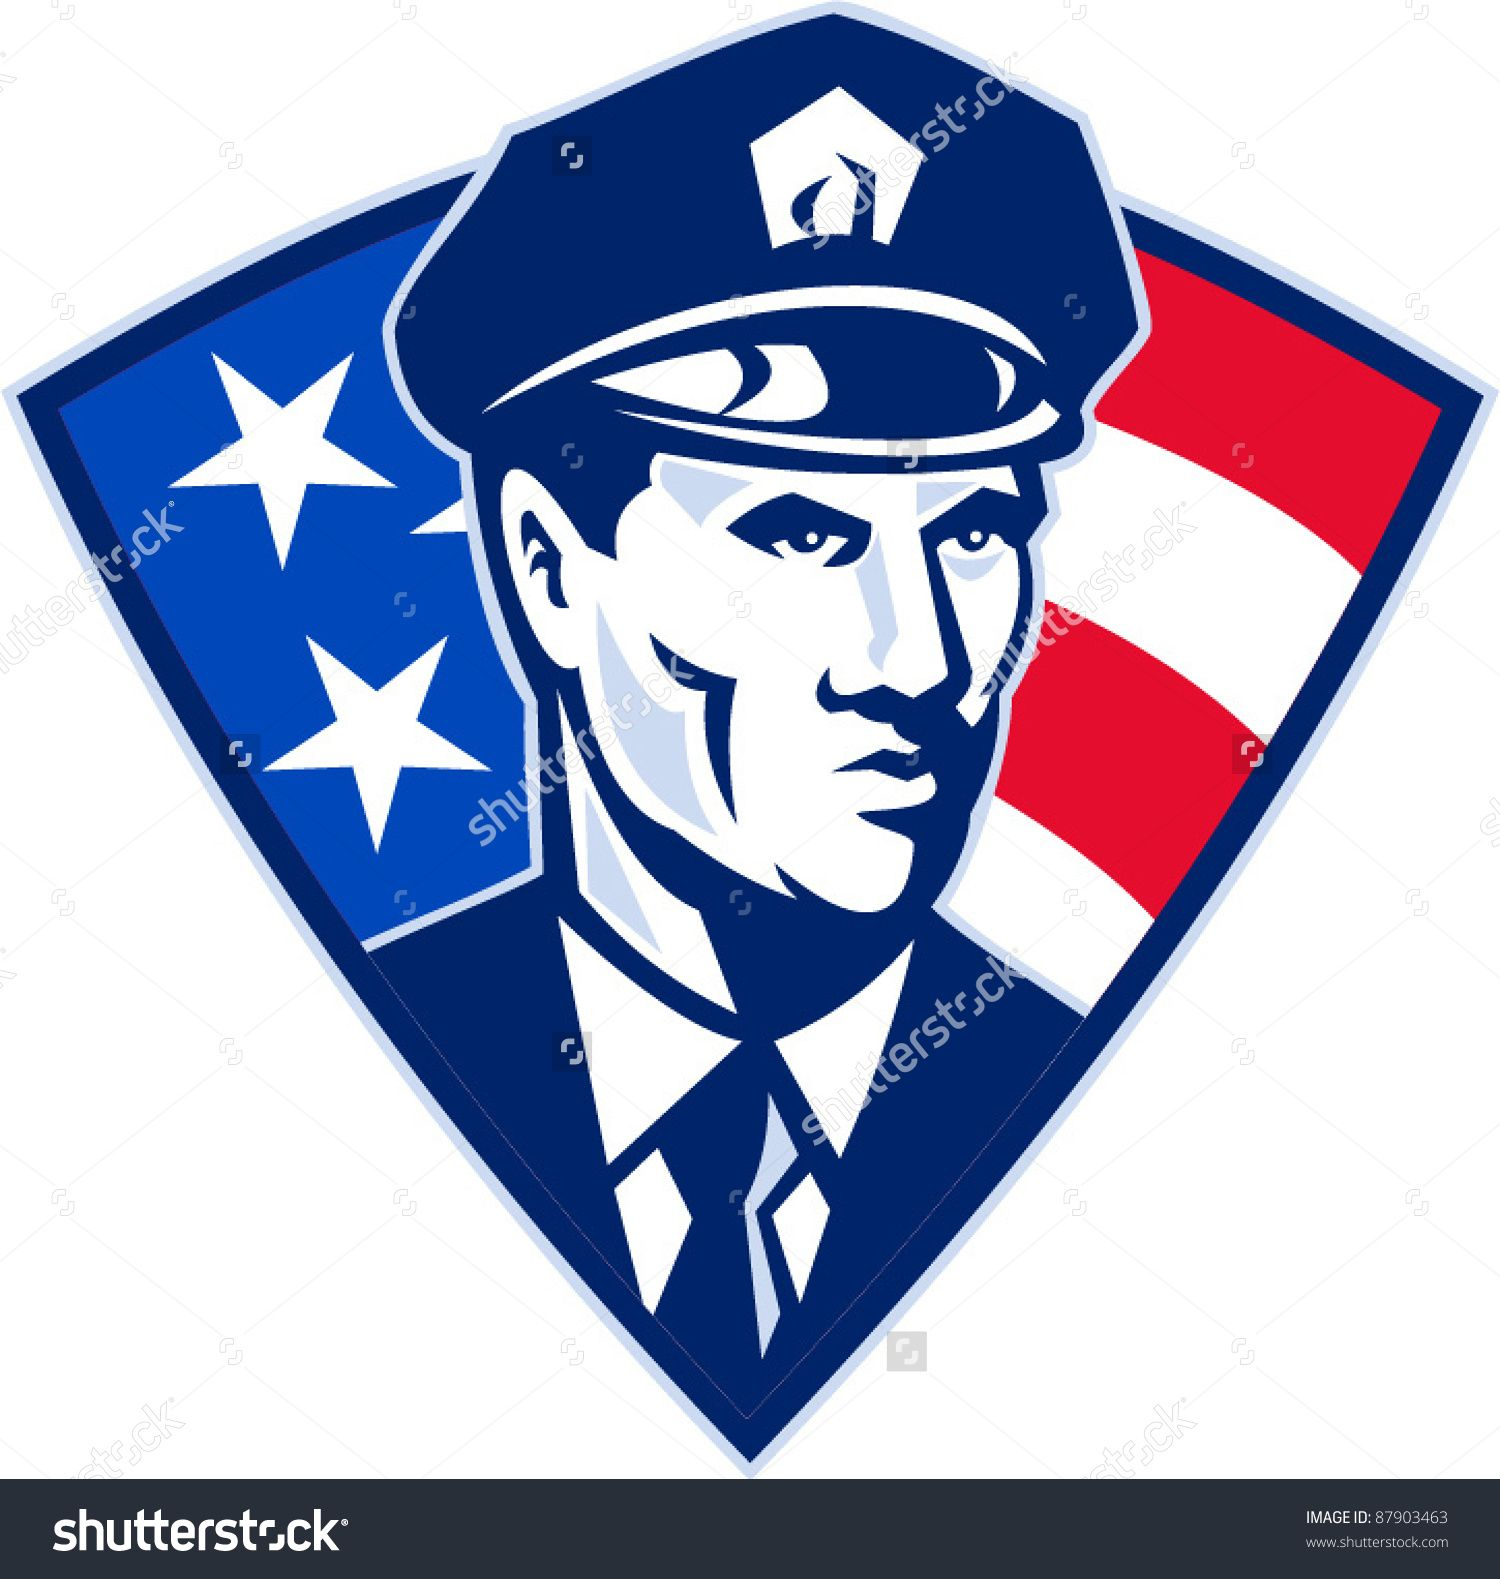 vector illustration of an American policeman police